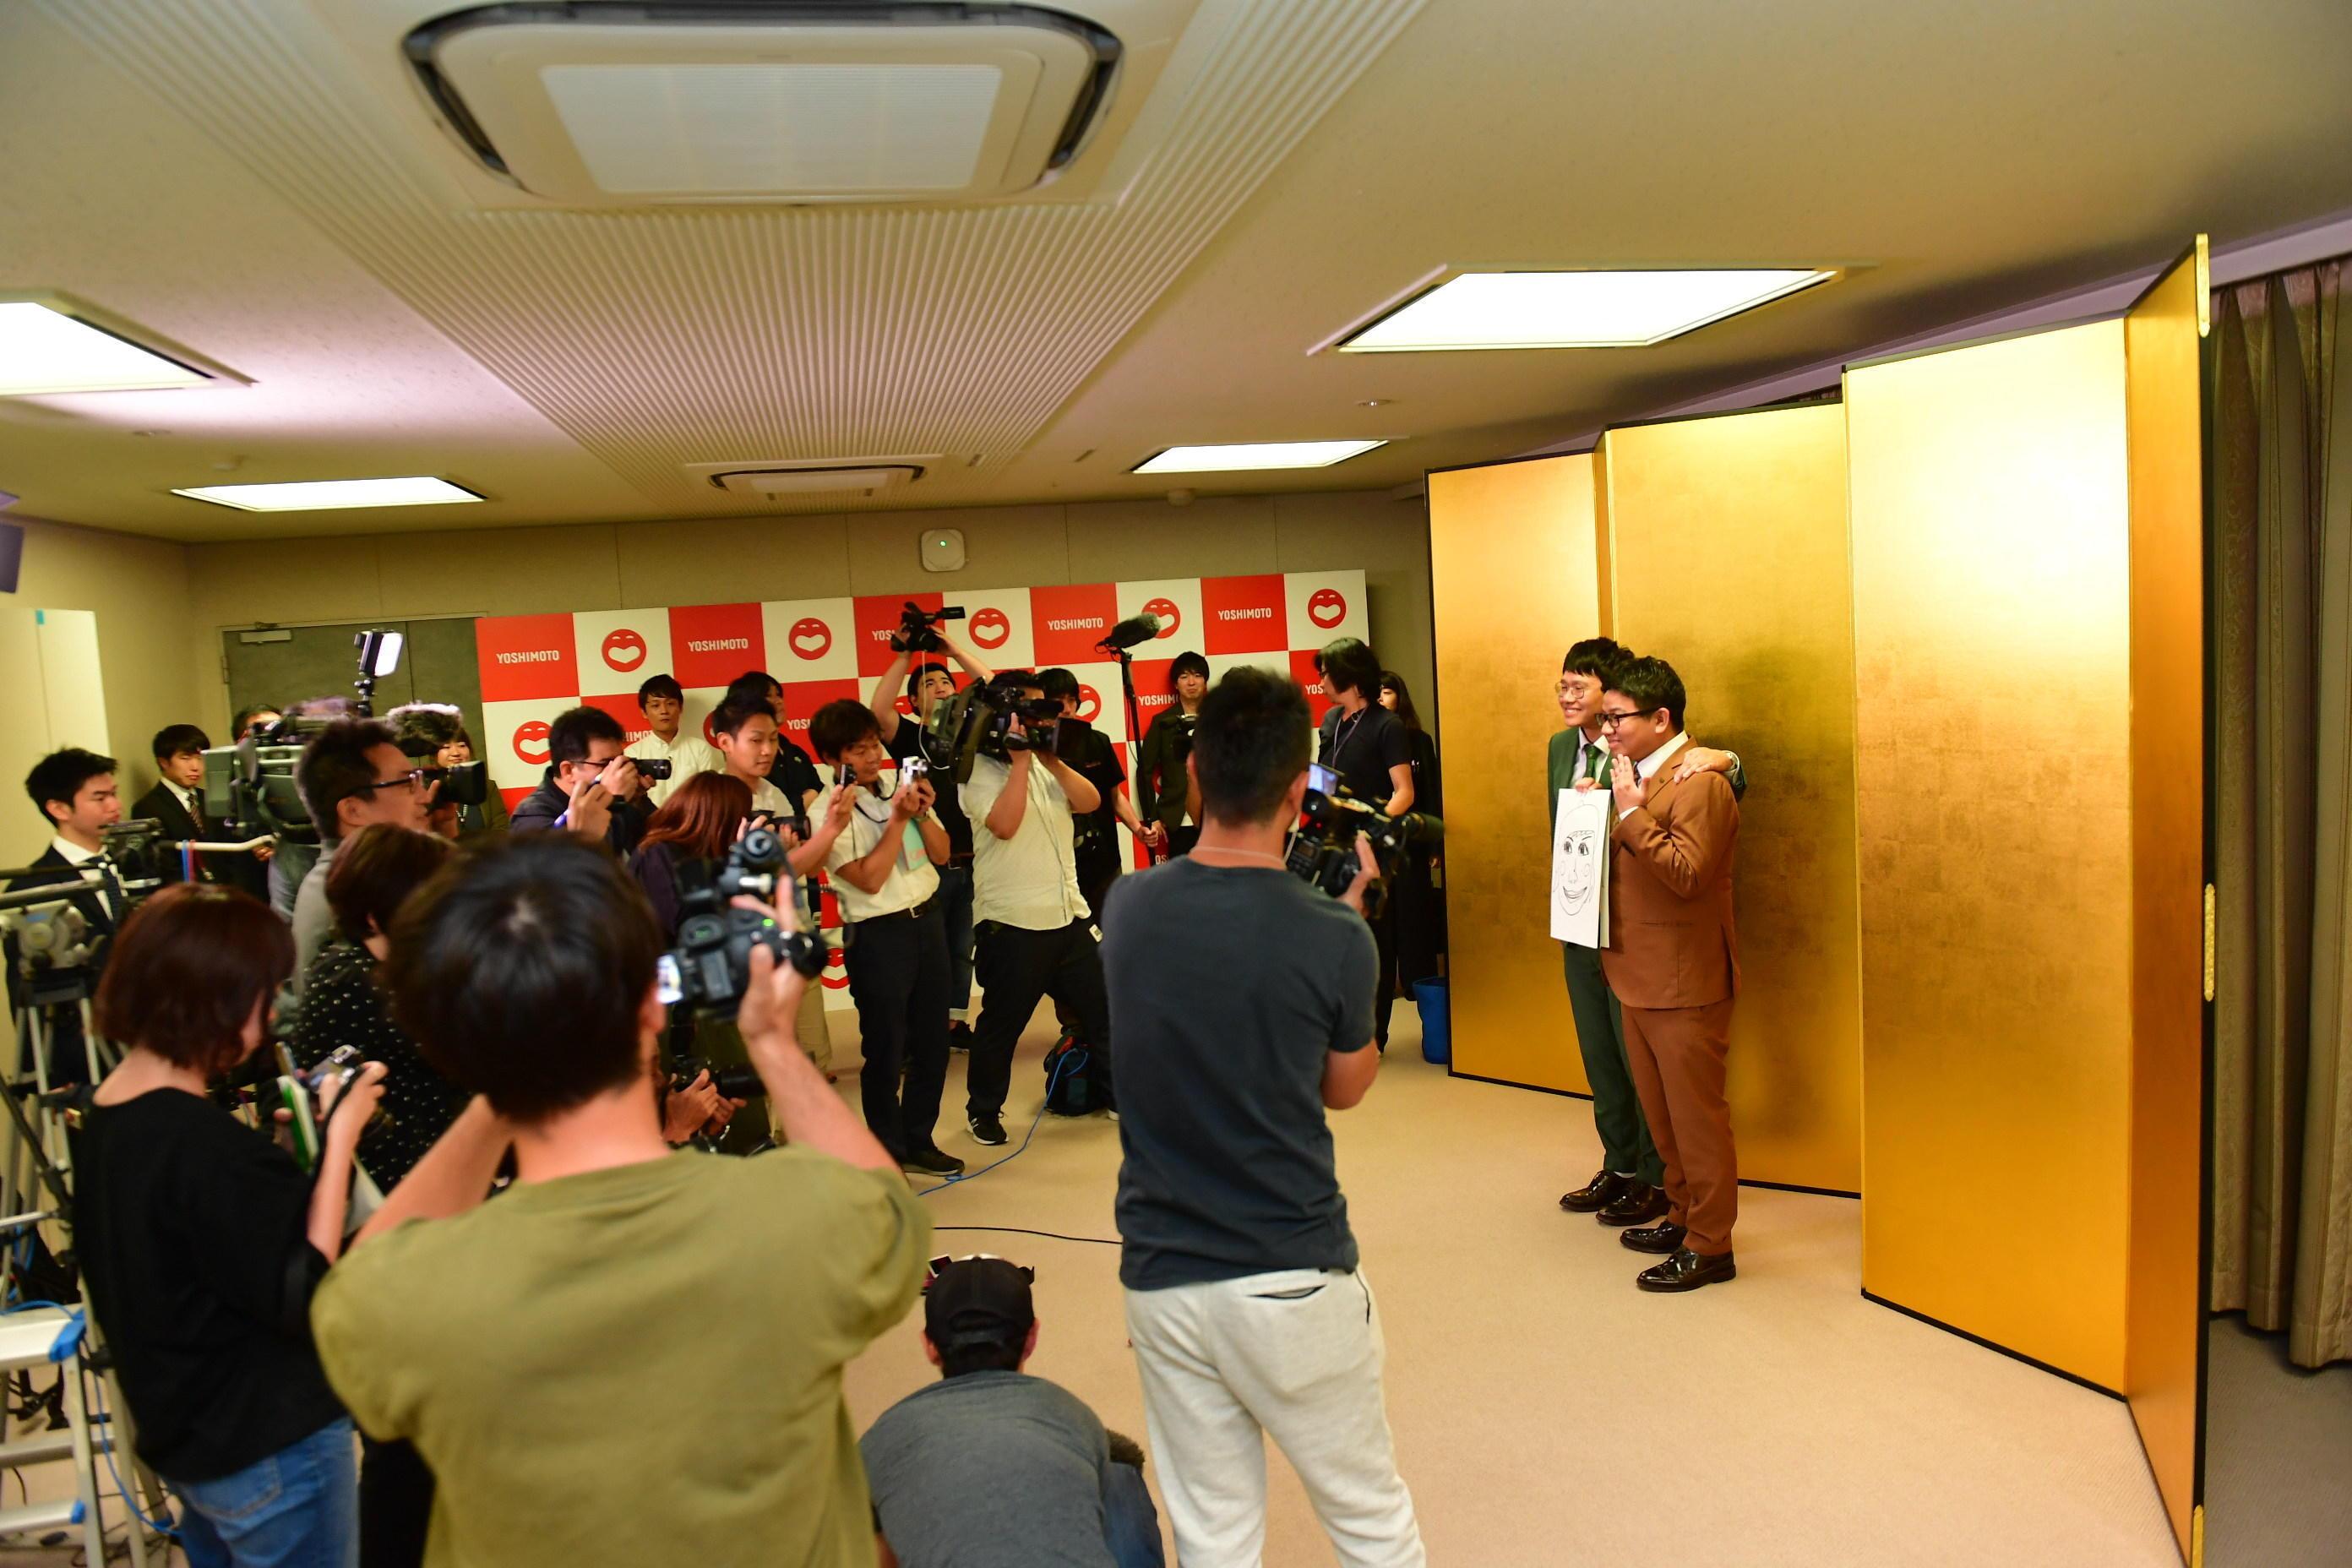 http://news.yoshimoto.co.jp/20180608052033-4a8e601c18f649c37b56e98abc35275ff8bb56ff.jpg